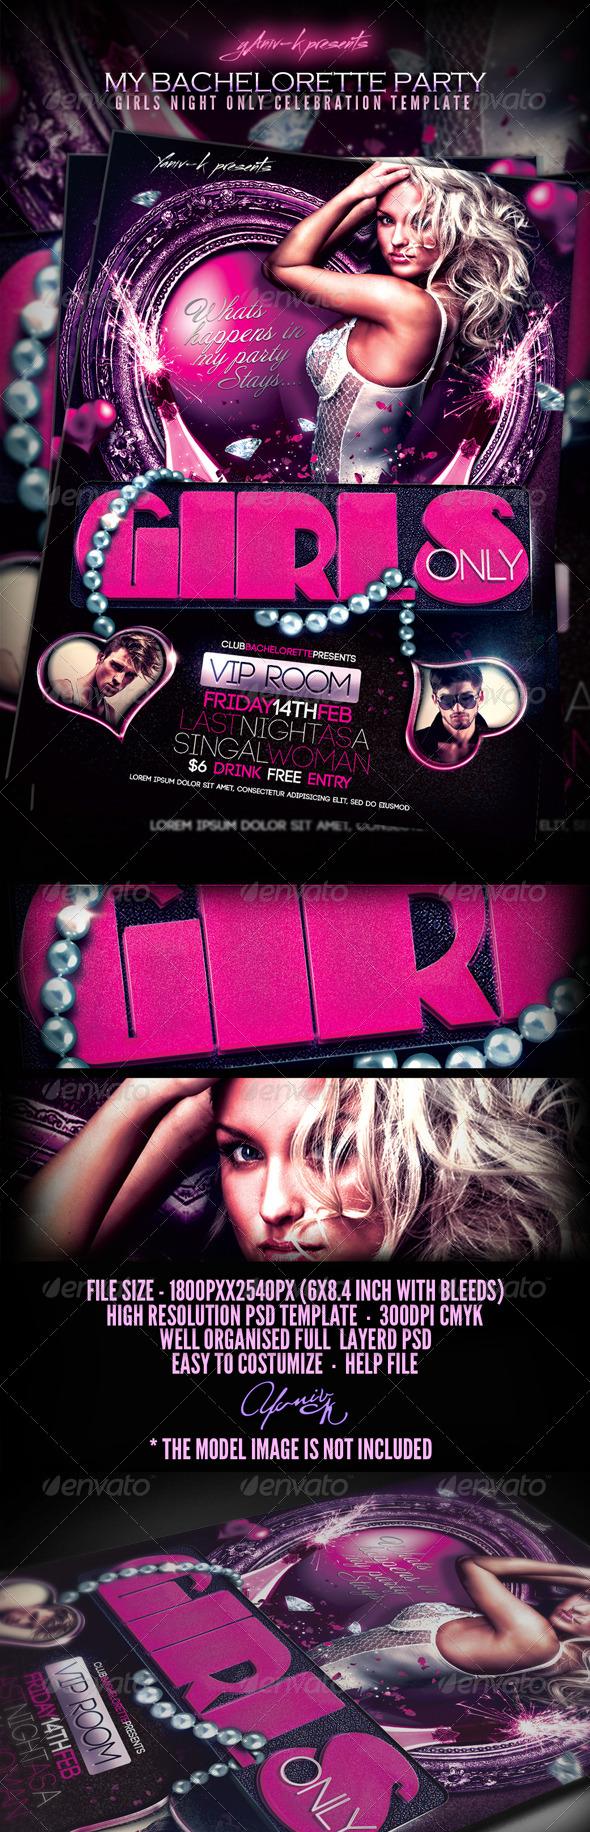 My Bachelorette/ Girls Night Party Invitation (Flyers ...